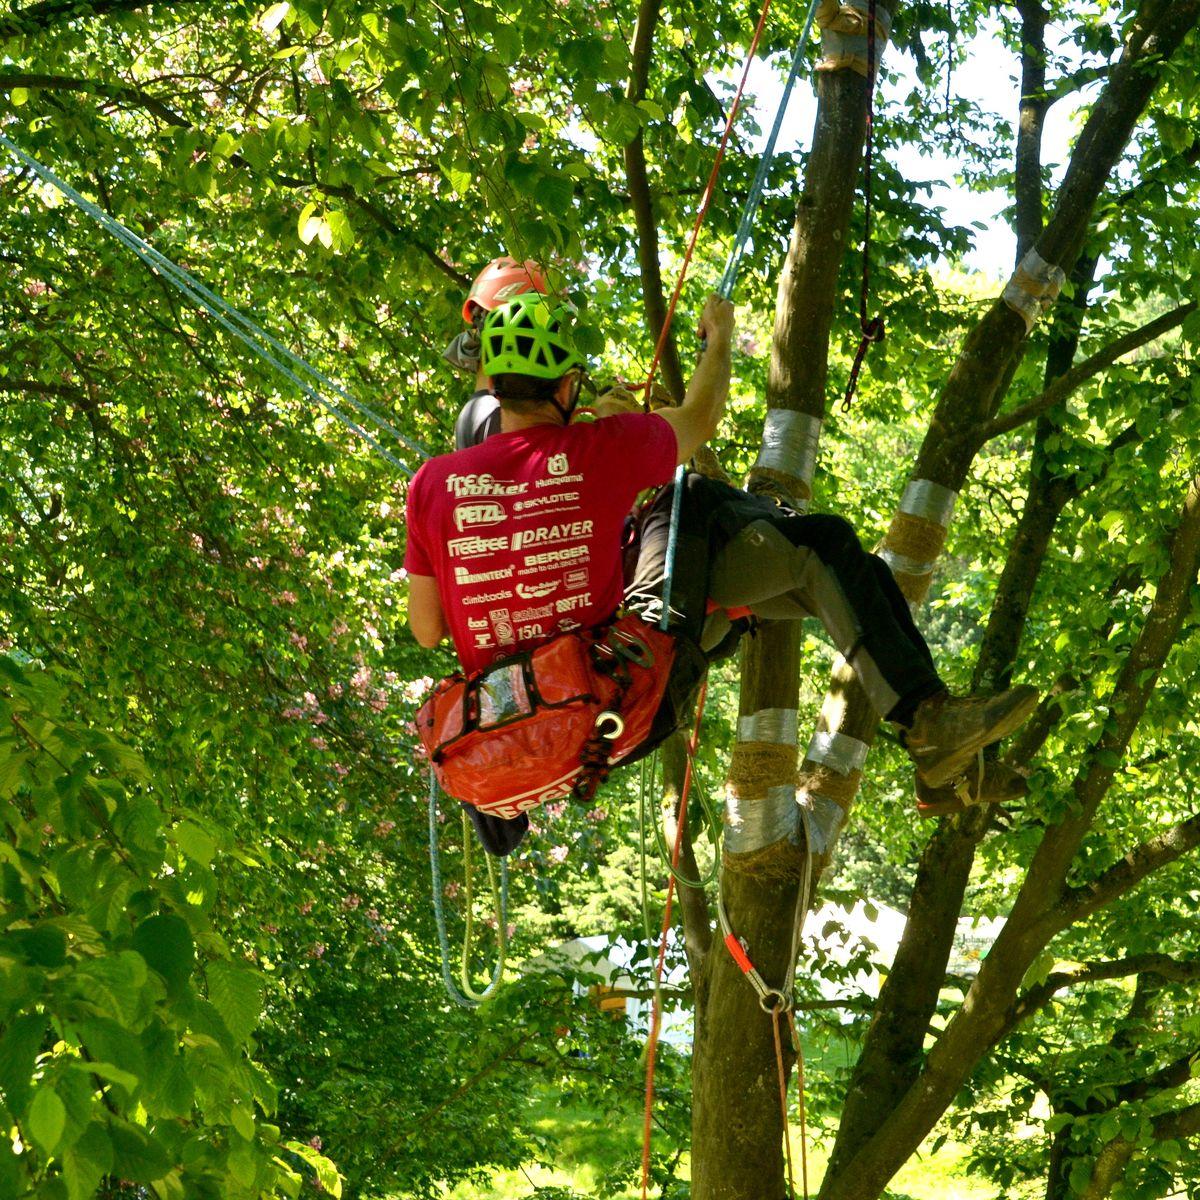 Baumkletter-Meisterschaften: Disziplin Areal Rescue